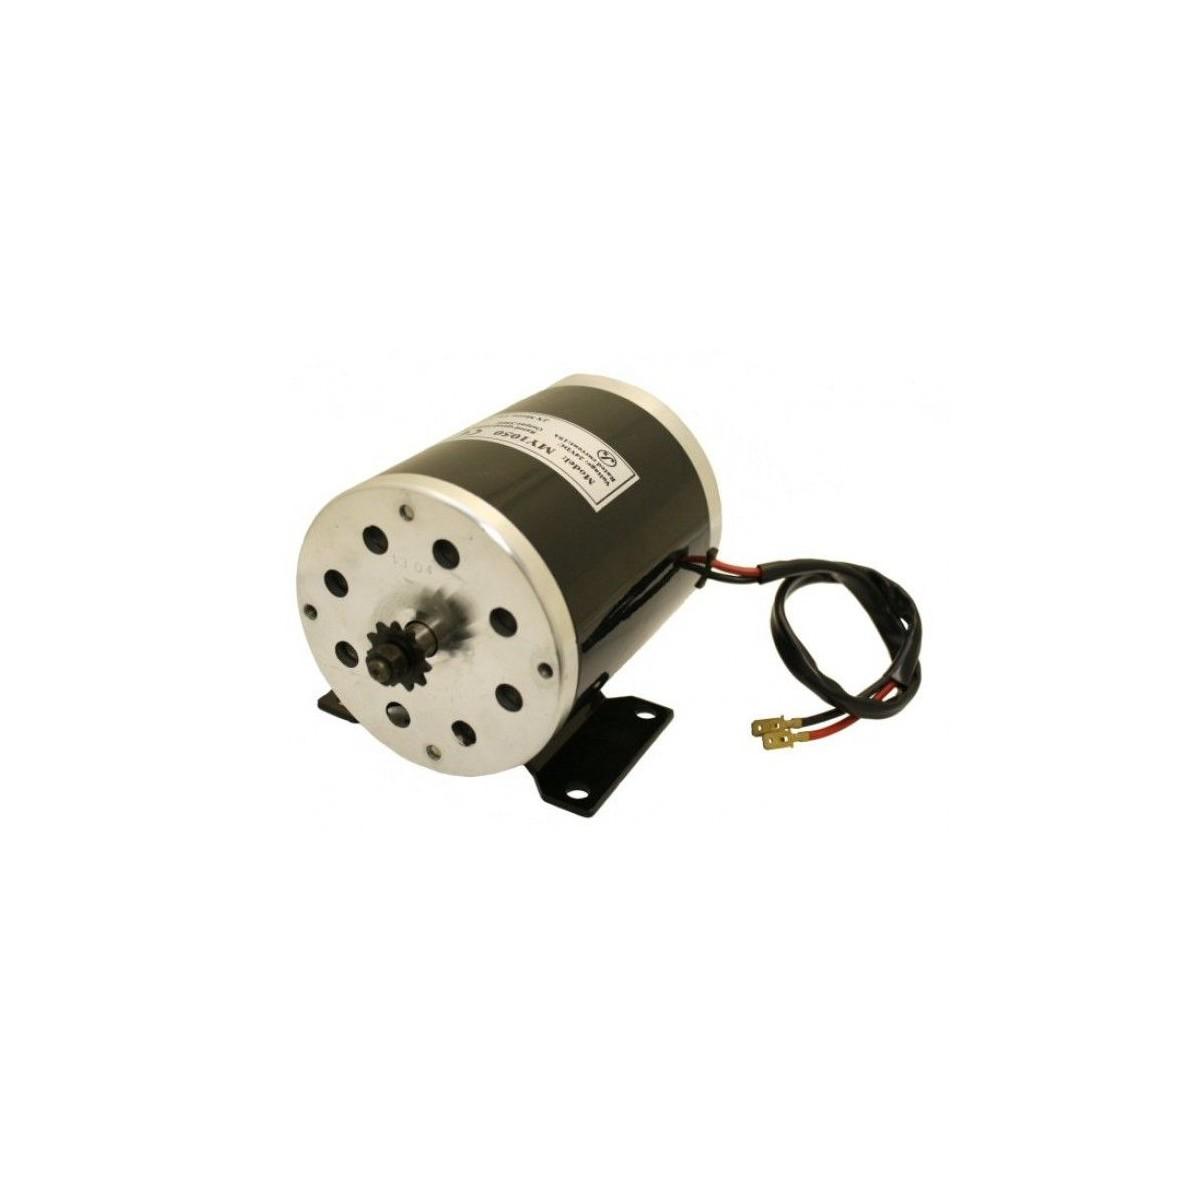 Moped 49cc pedale fara carnet